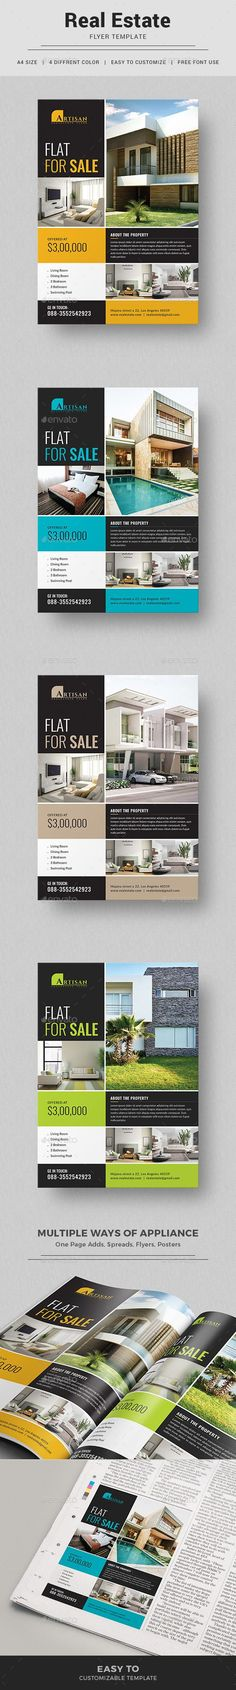 Real Estate Flyer Template PSD. Download here: https://graphicriver.net/item/real-estate-flyer/17525381?ref=ksioks